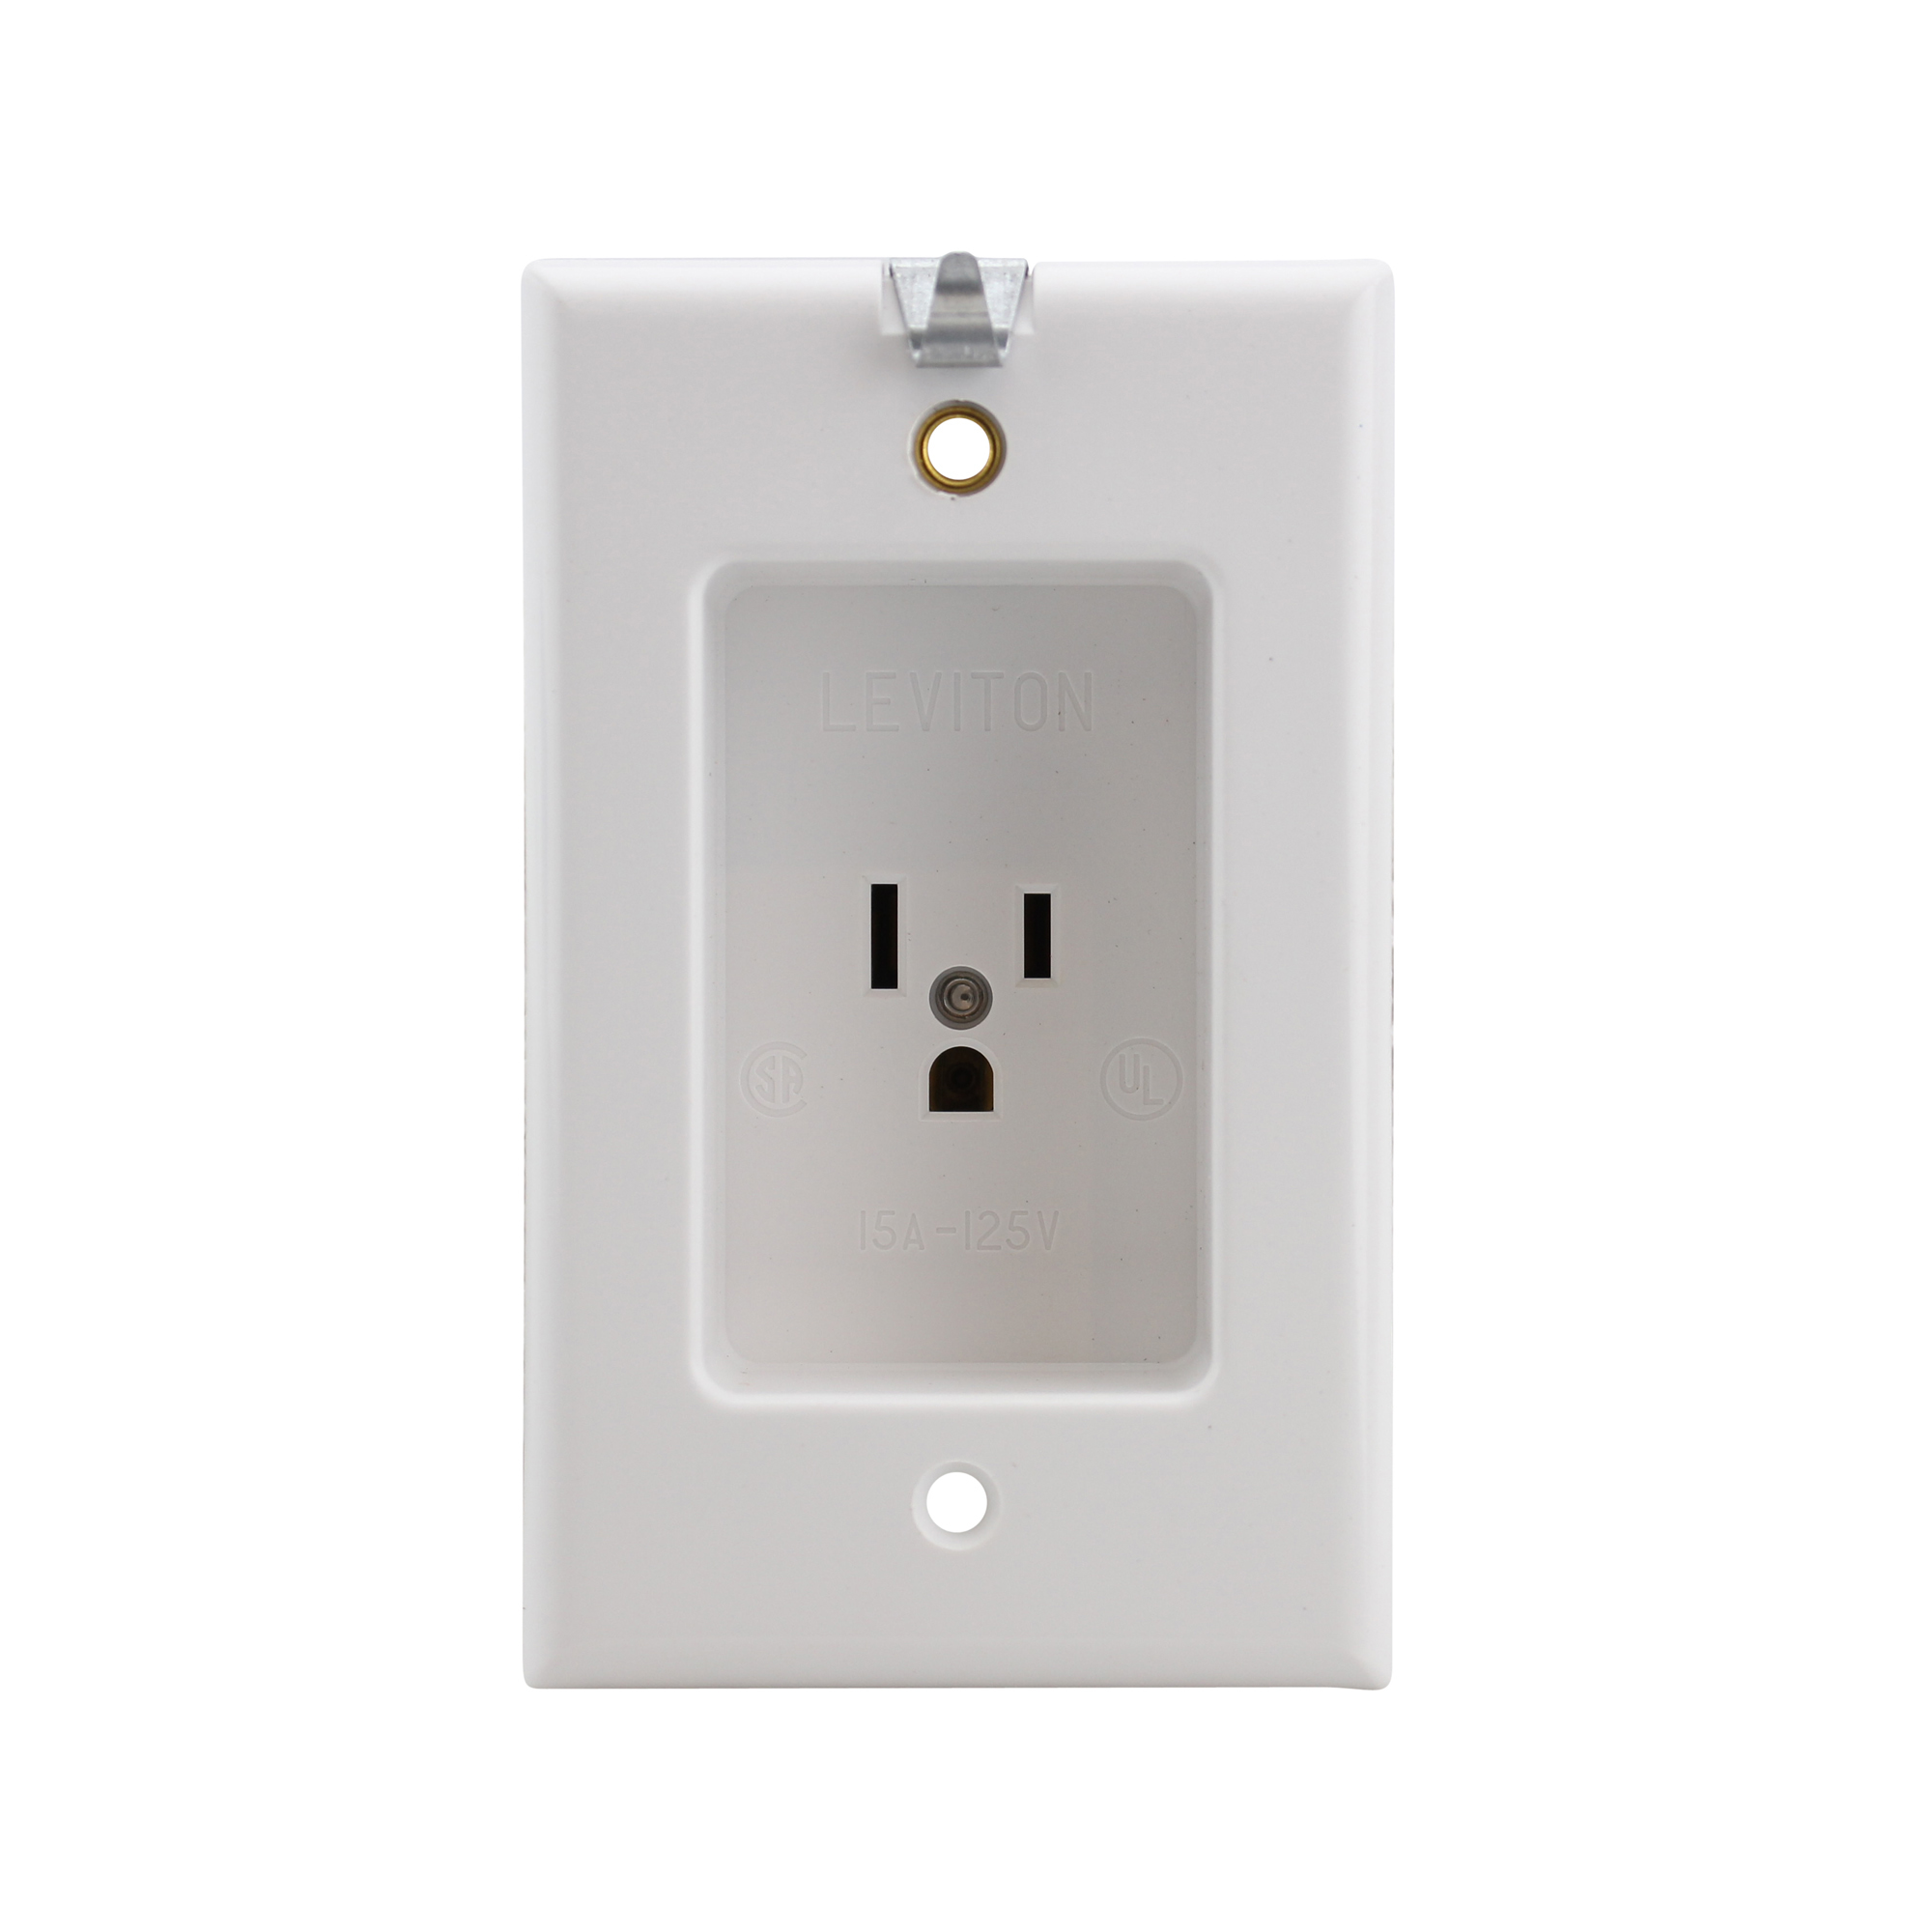 leviton 30a flush mount power outlet wiring diagram 51 - Heyo.co ...